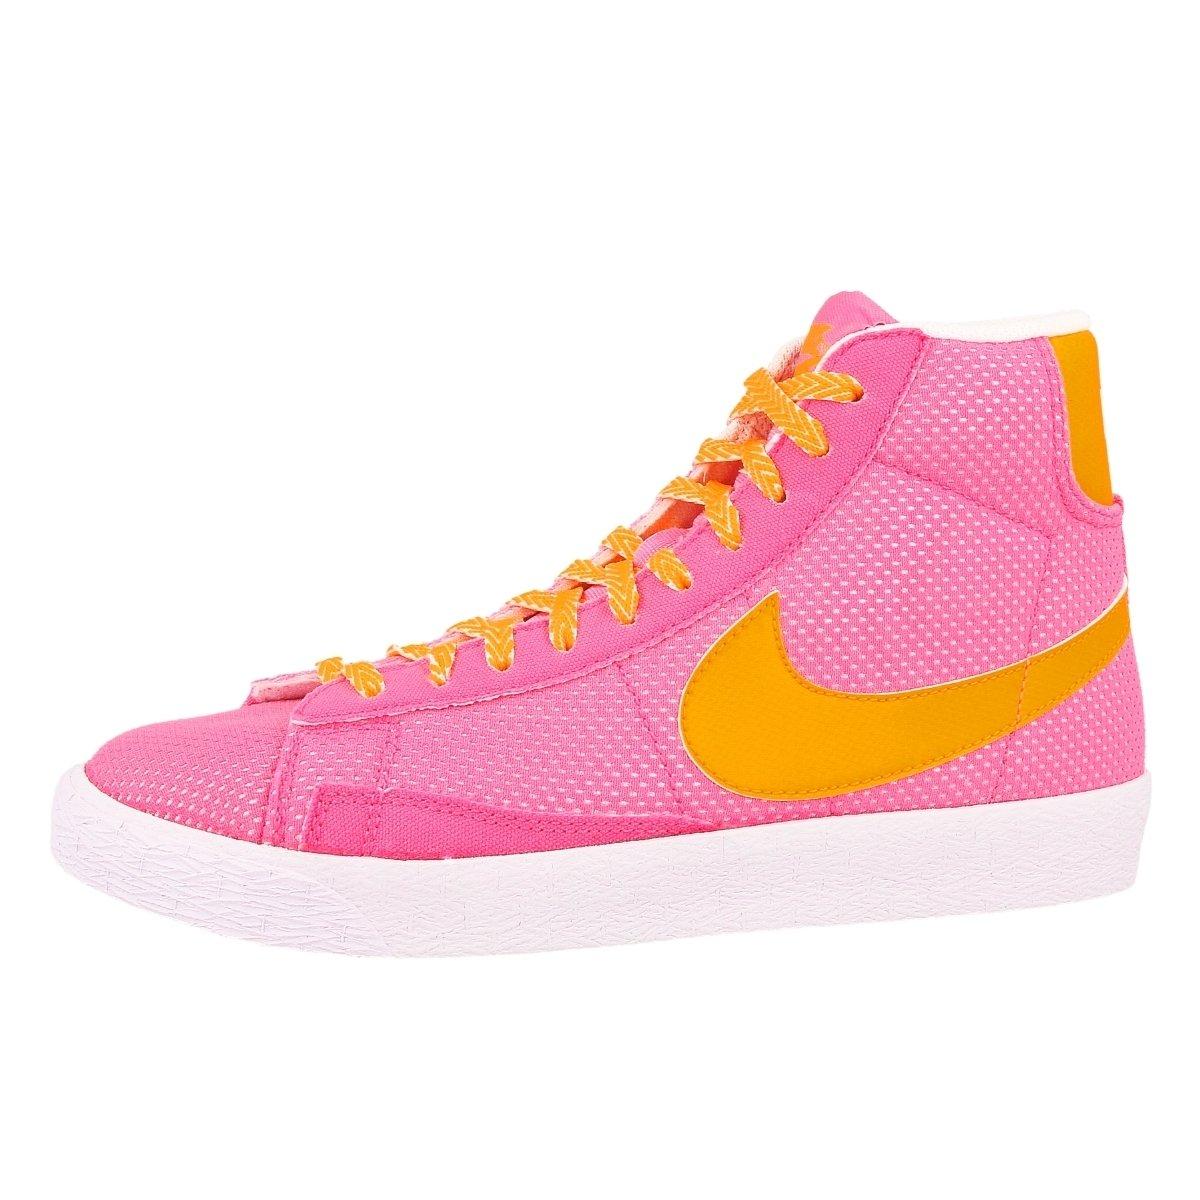 9e7733ef21aec Amazon.com | Nike blazer mid vintage (GS) hi top trainers 539930 602 ...